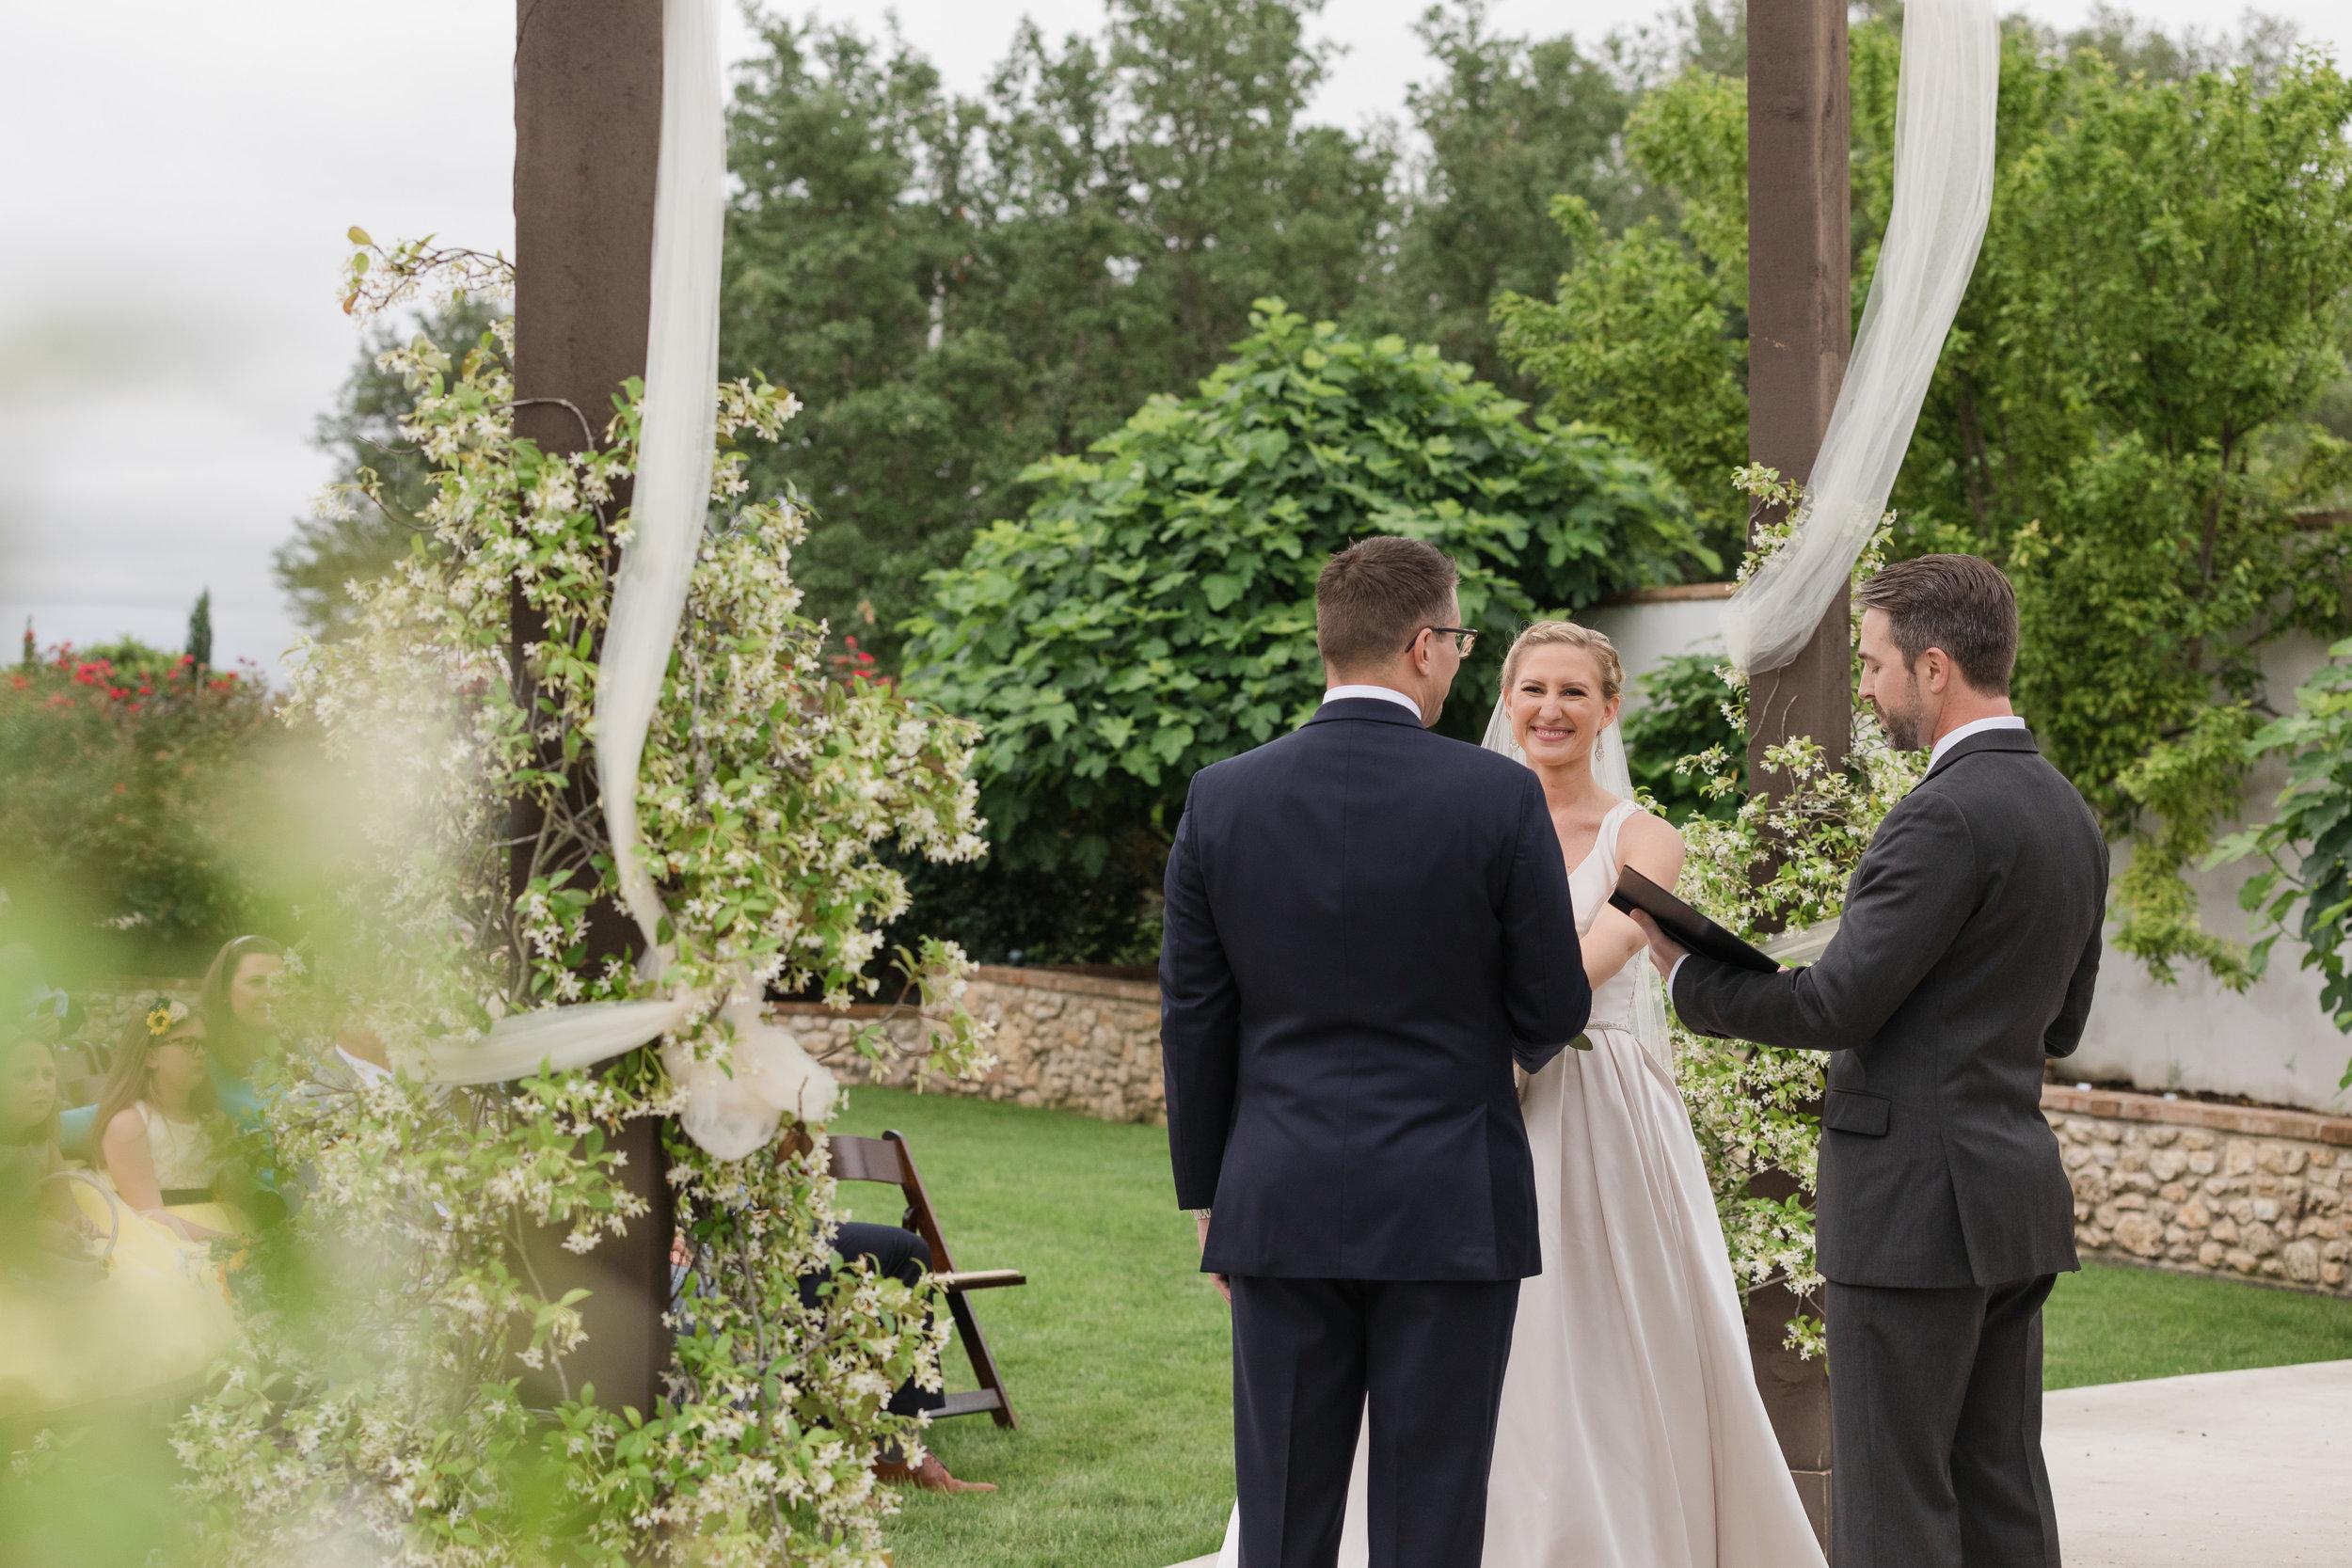 Laufs-Wedding-370.jpg